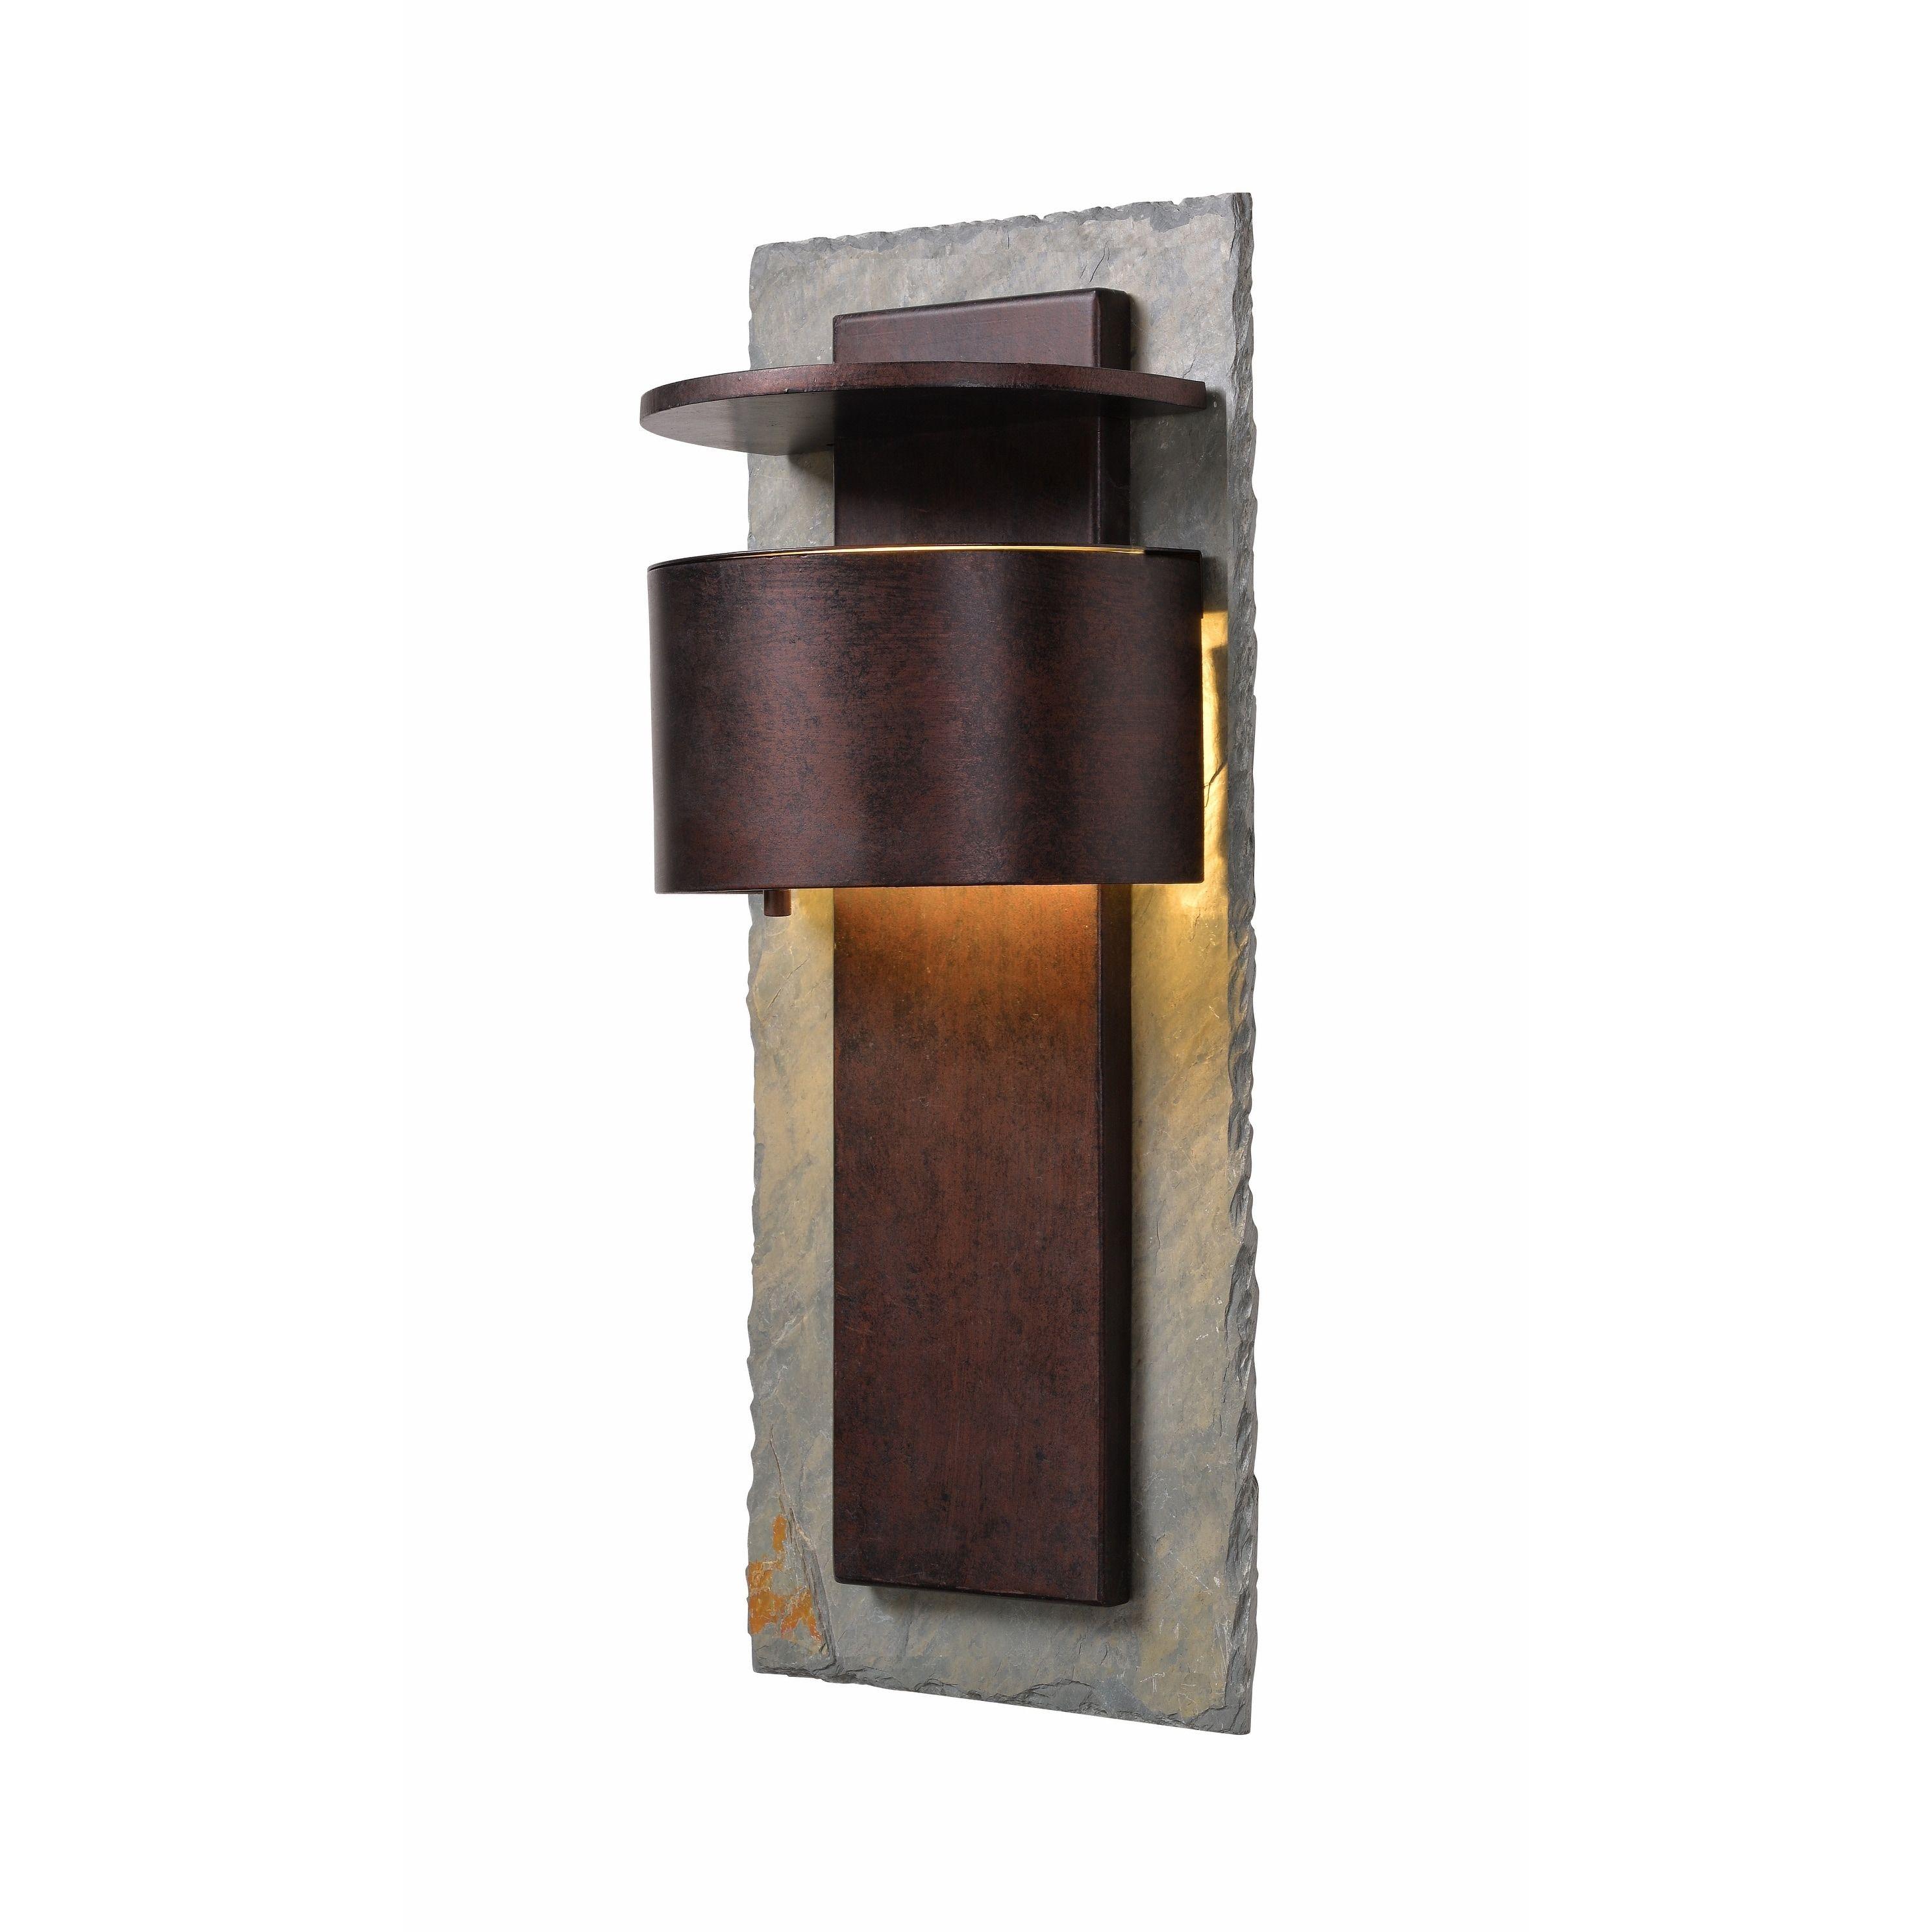 Darius 19 Dark Sky Led Wall Lantern Slate And Copper Multicolor Design Craft Outdoor Wall Lantern Outdoor Wall Lighting